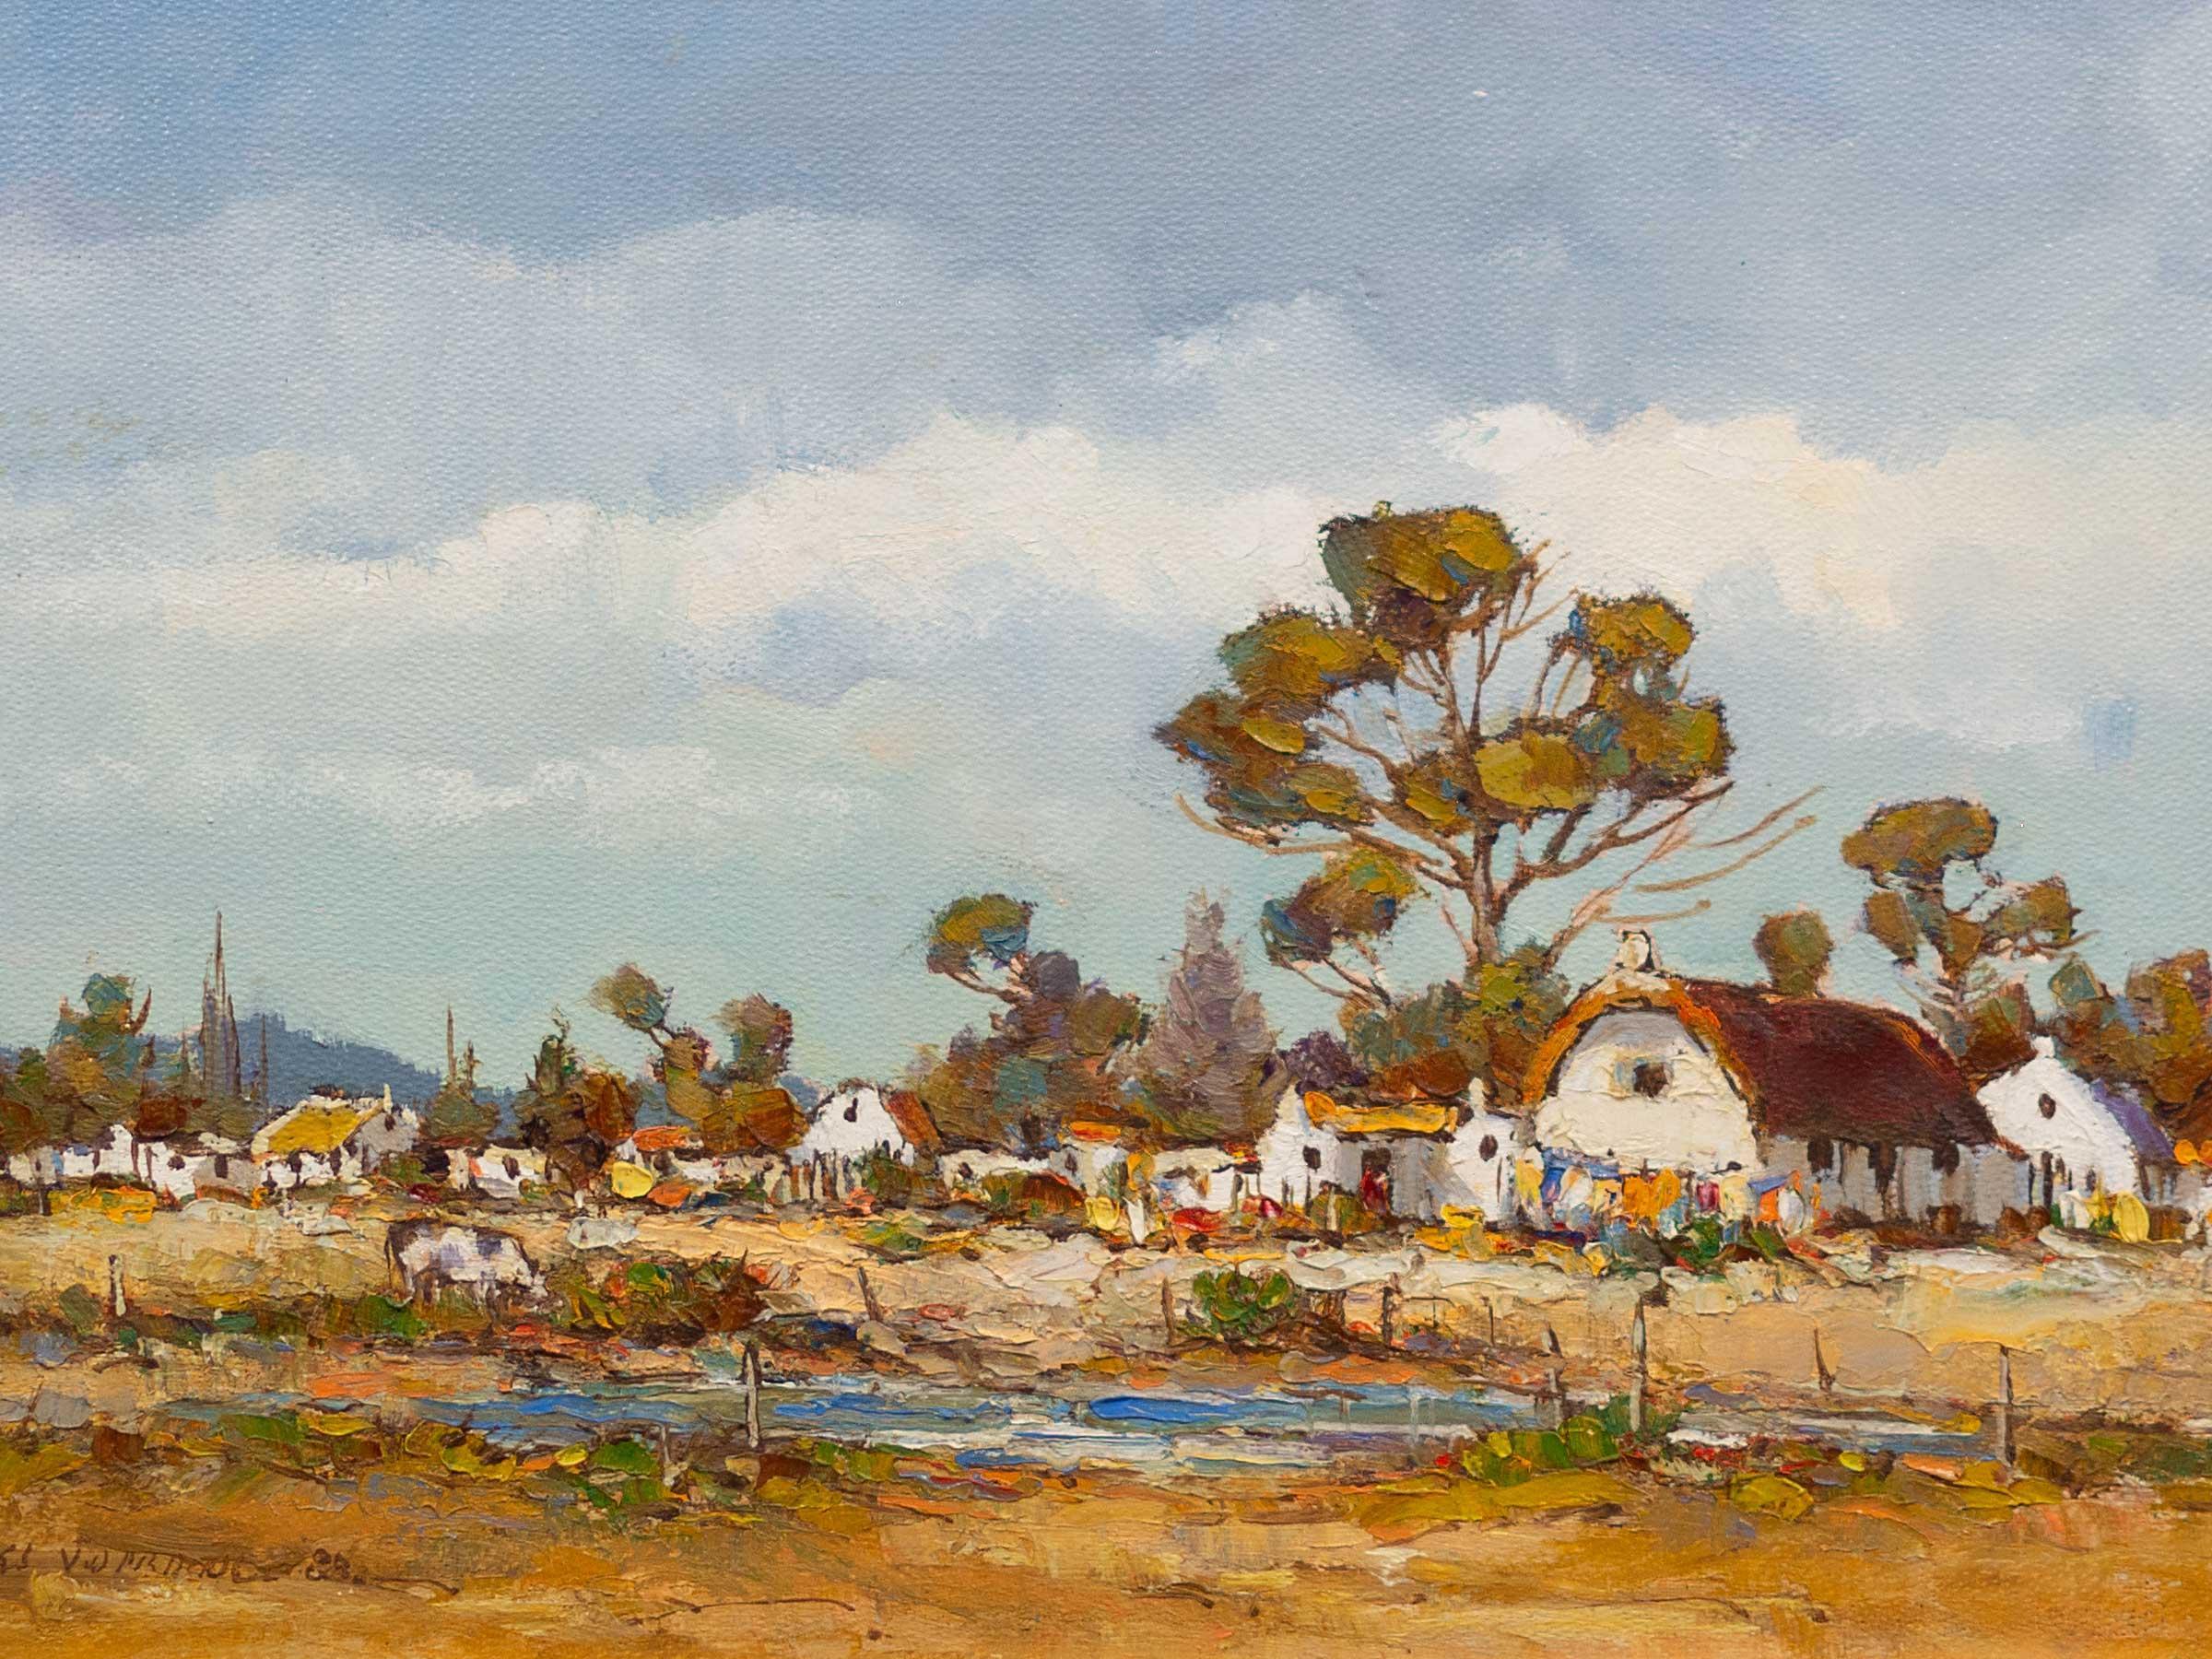 Charles van der Merwe (SA 1938 - 1996) Oil, Cape Dutch Cottages, Signed & Dated '88, 25 x 35